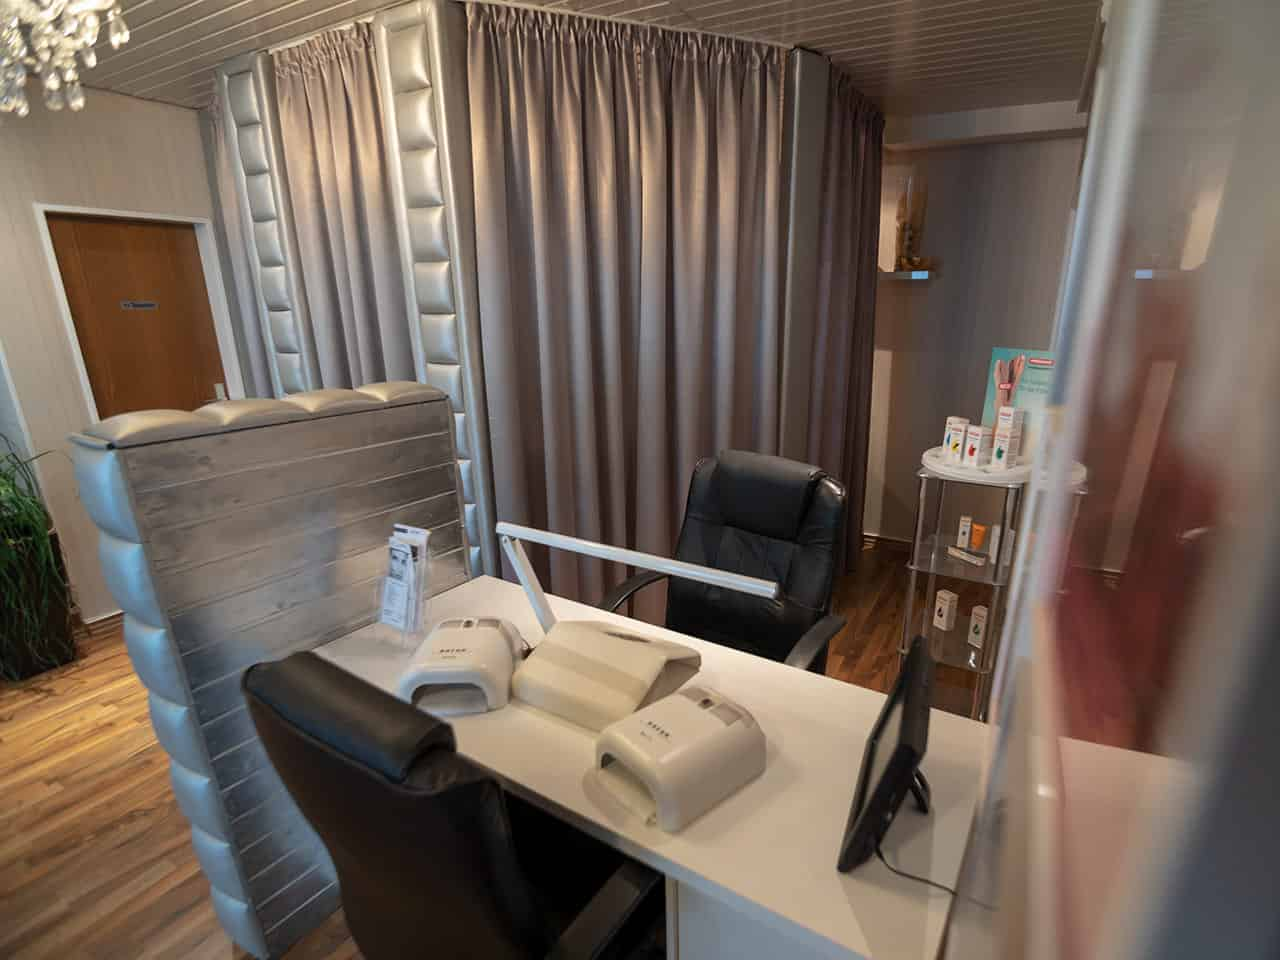 Haarstudio Barock Salon Nageldesign